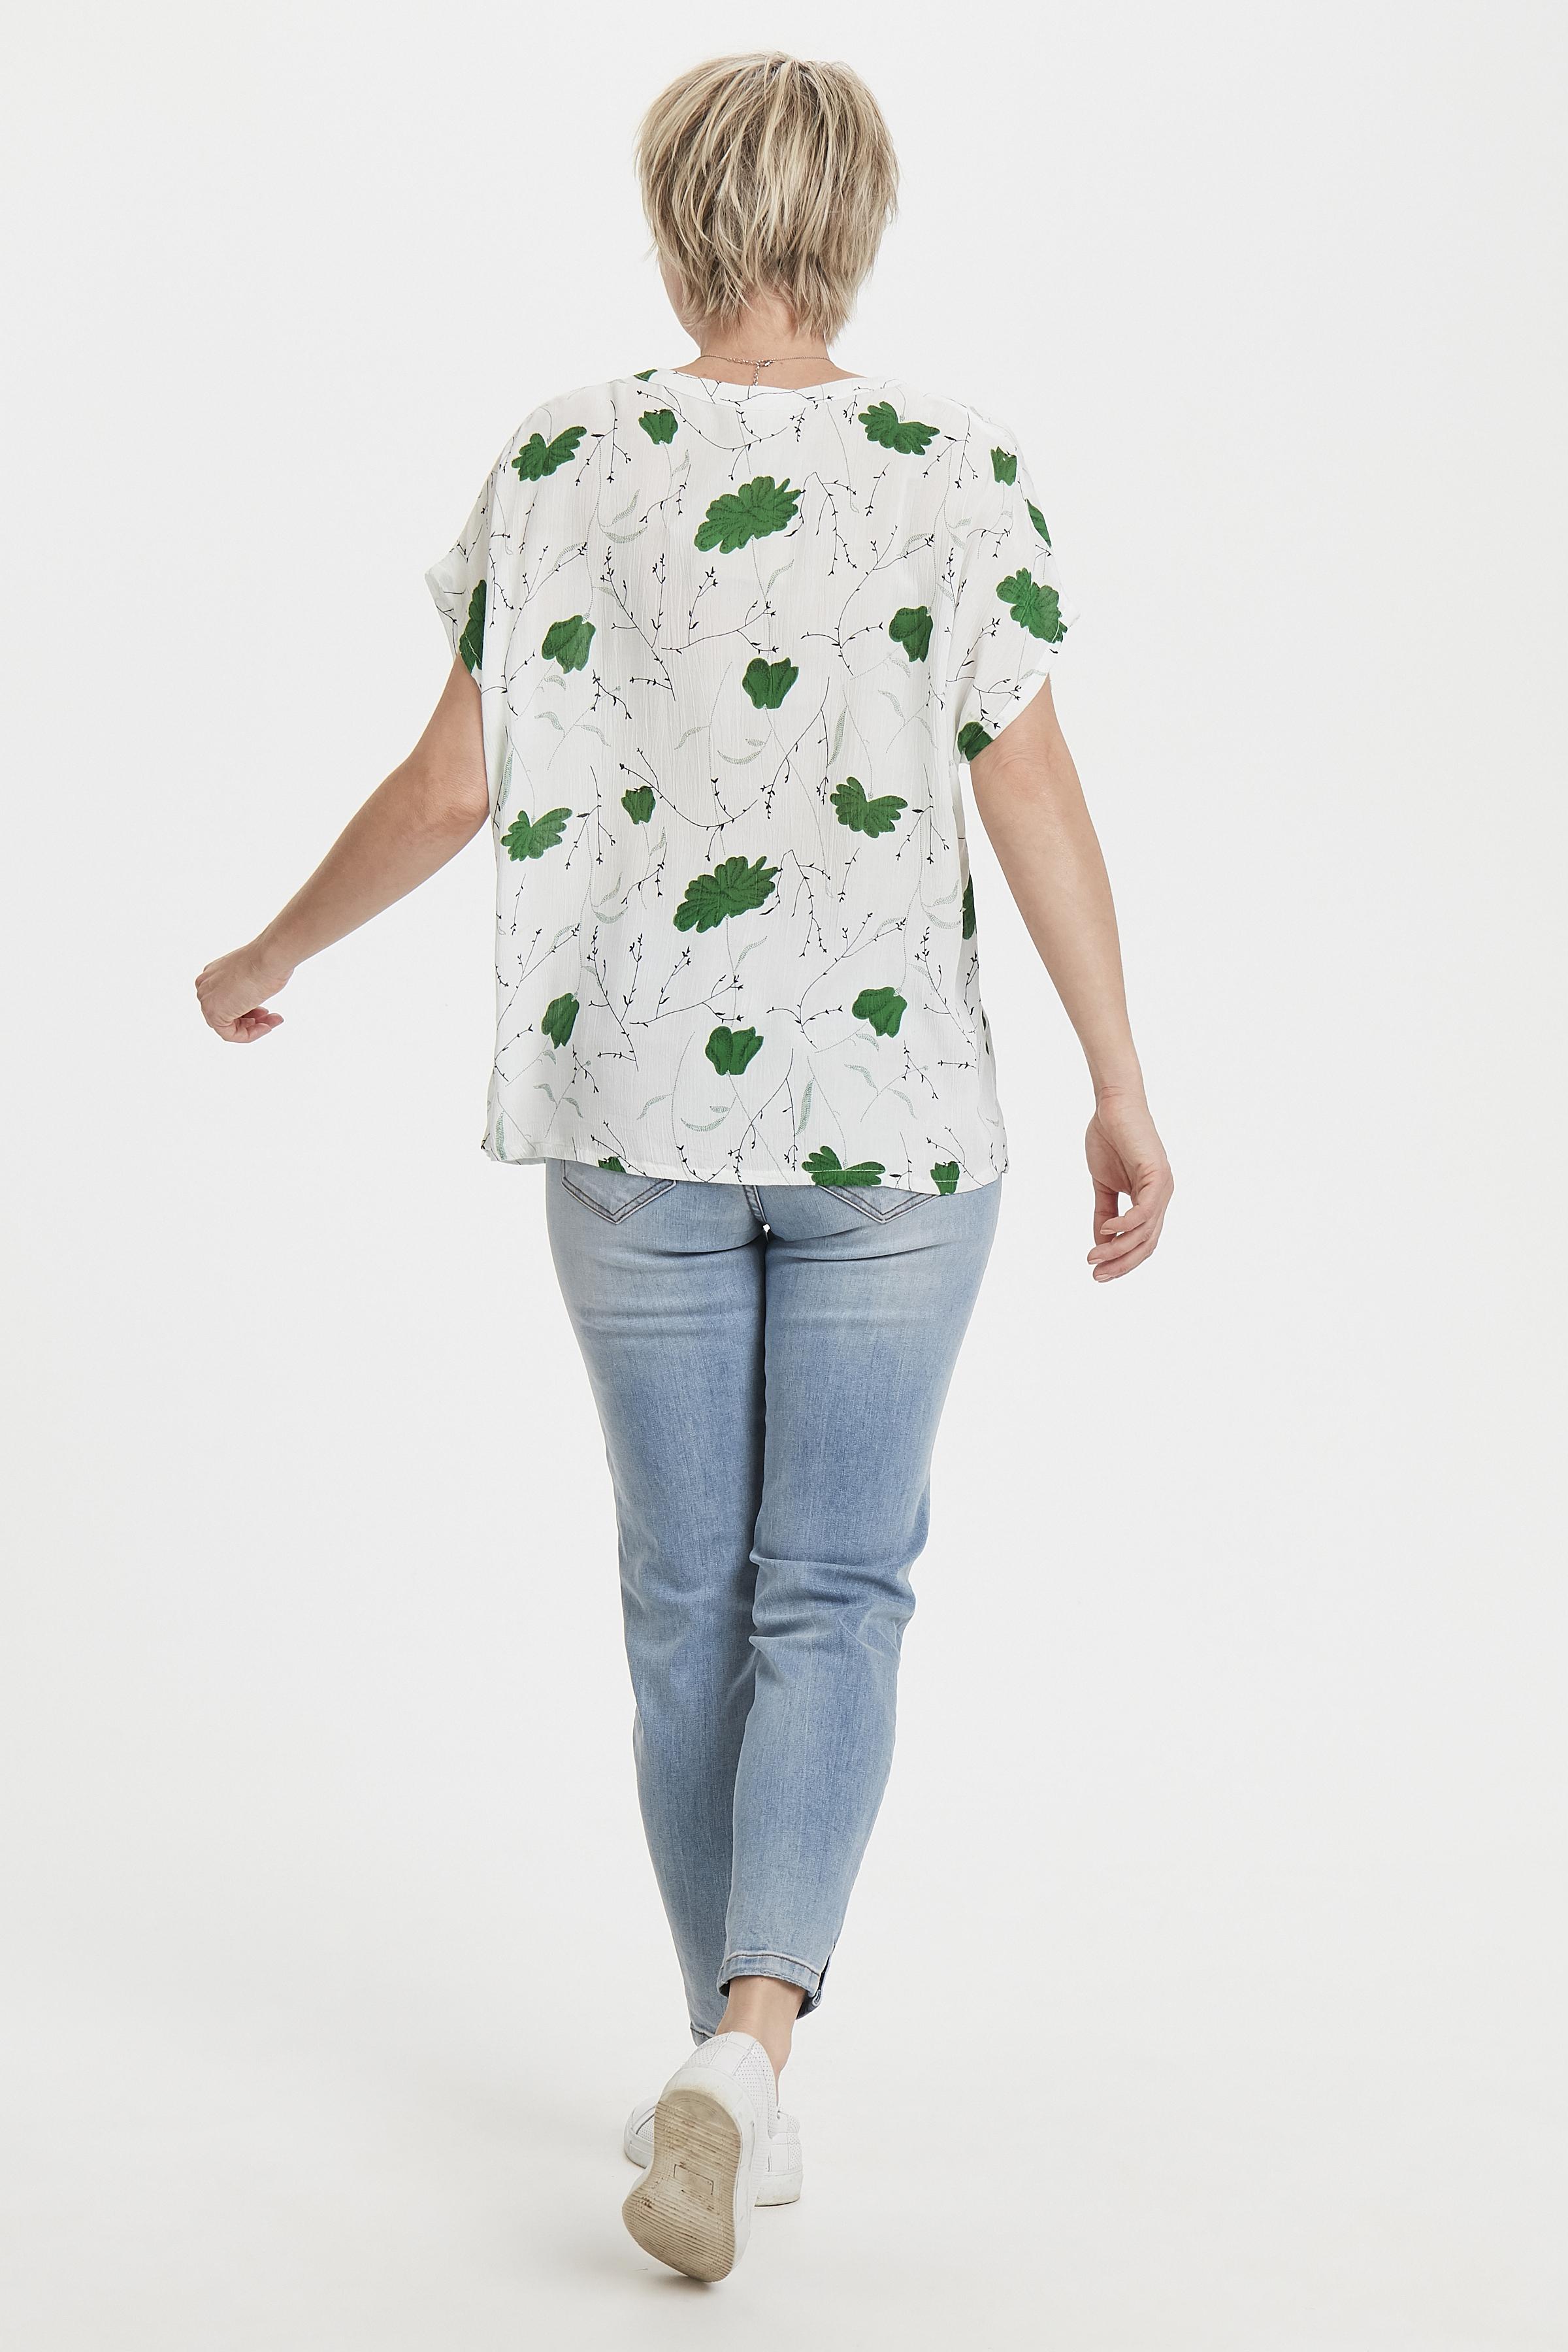 Weiss/grün Kurzarm-Bluse von Kaffe – Shoppen SieWeiss/grün Kurzarm-Bluse ab Gr. 34-46 hier